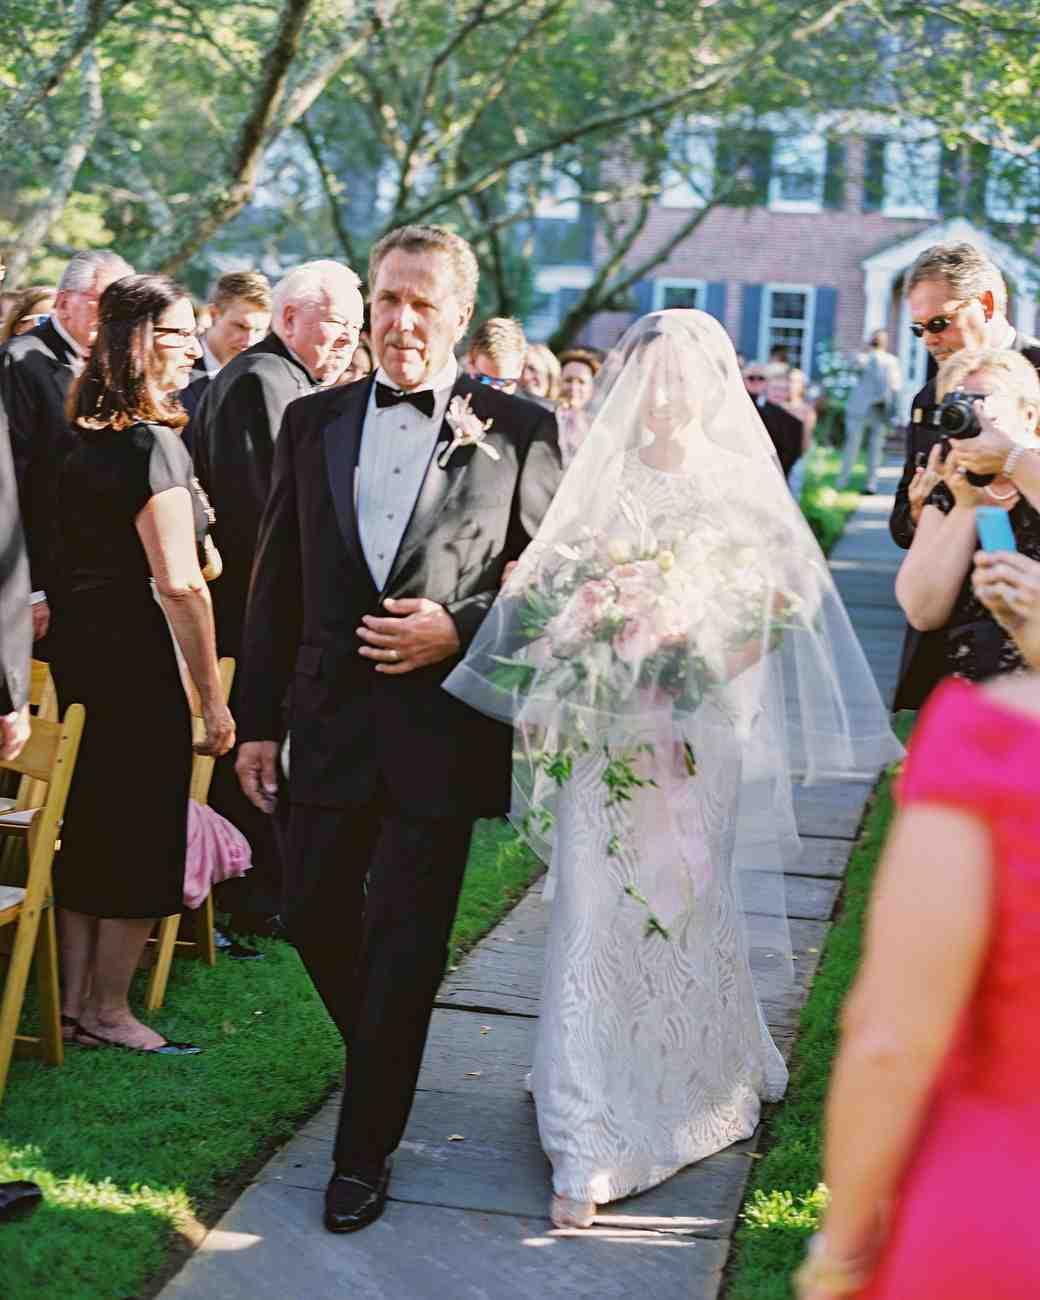 amy-garrison-wedding-veil-00478-6134266-0816.jpg